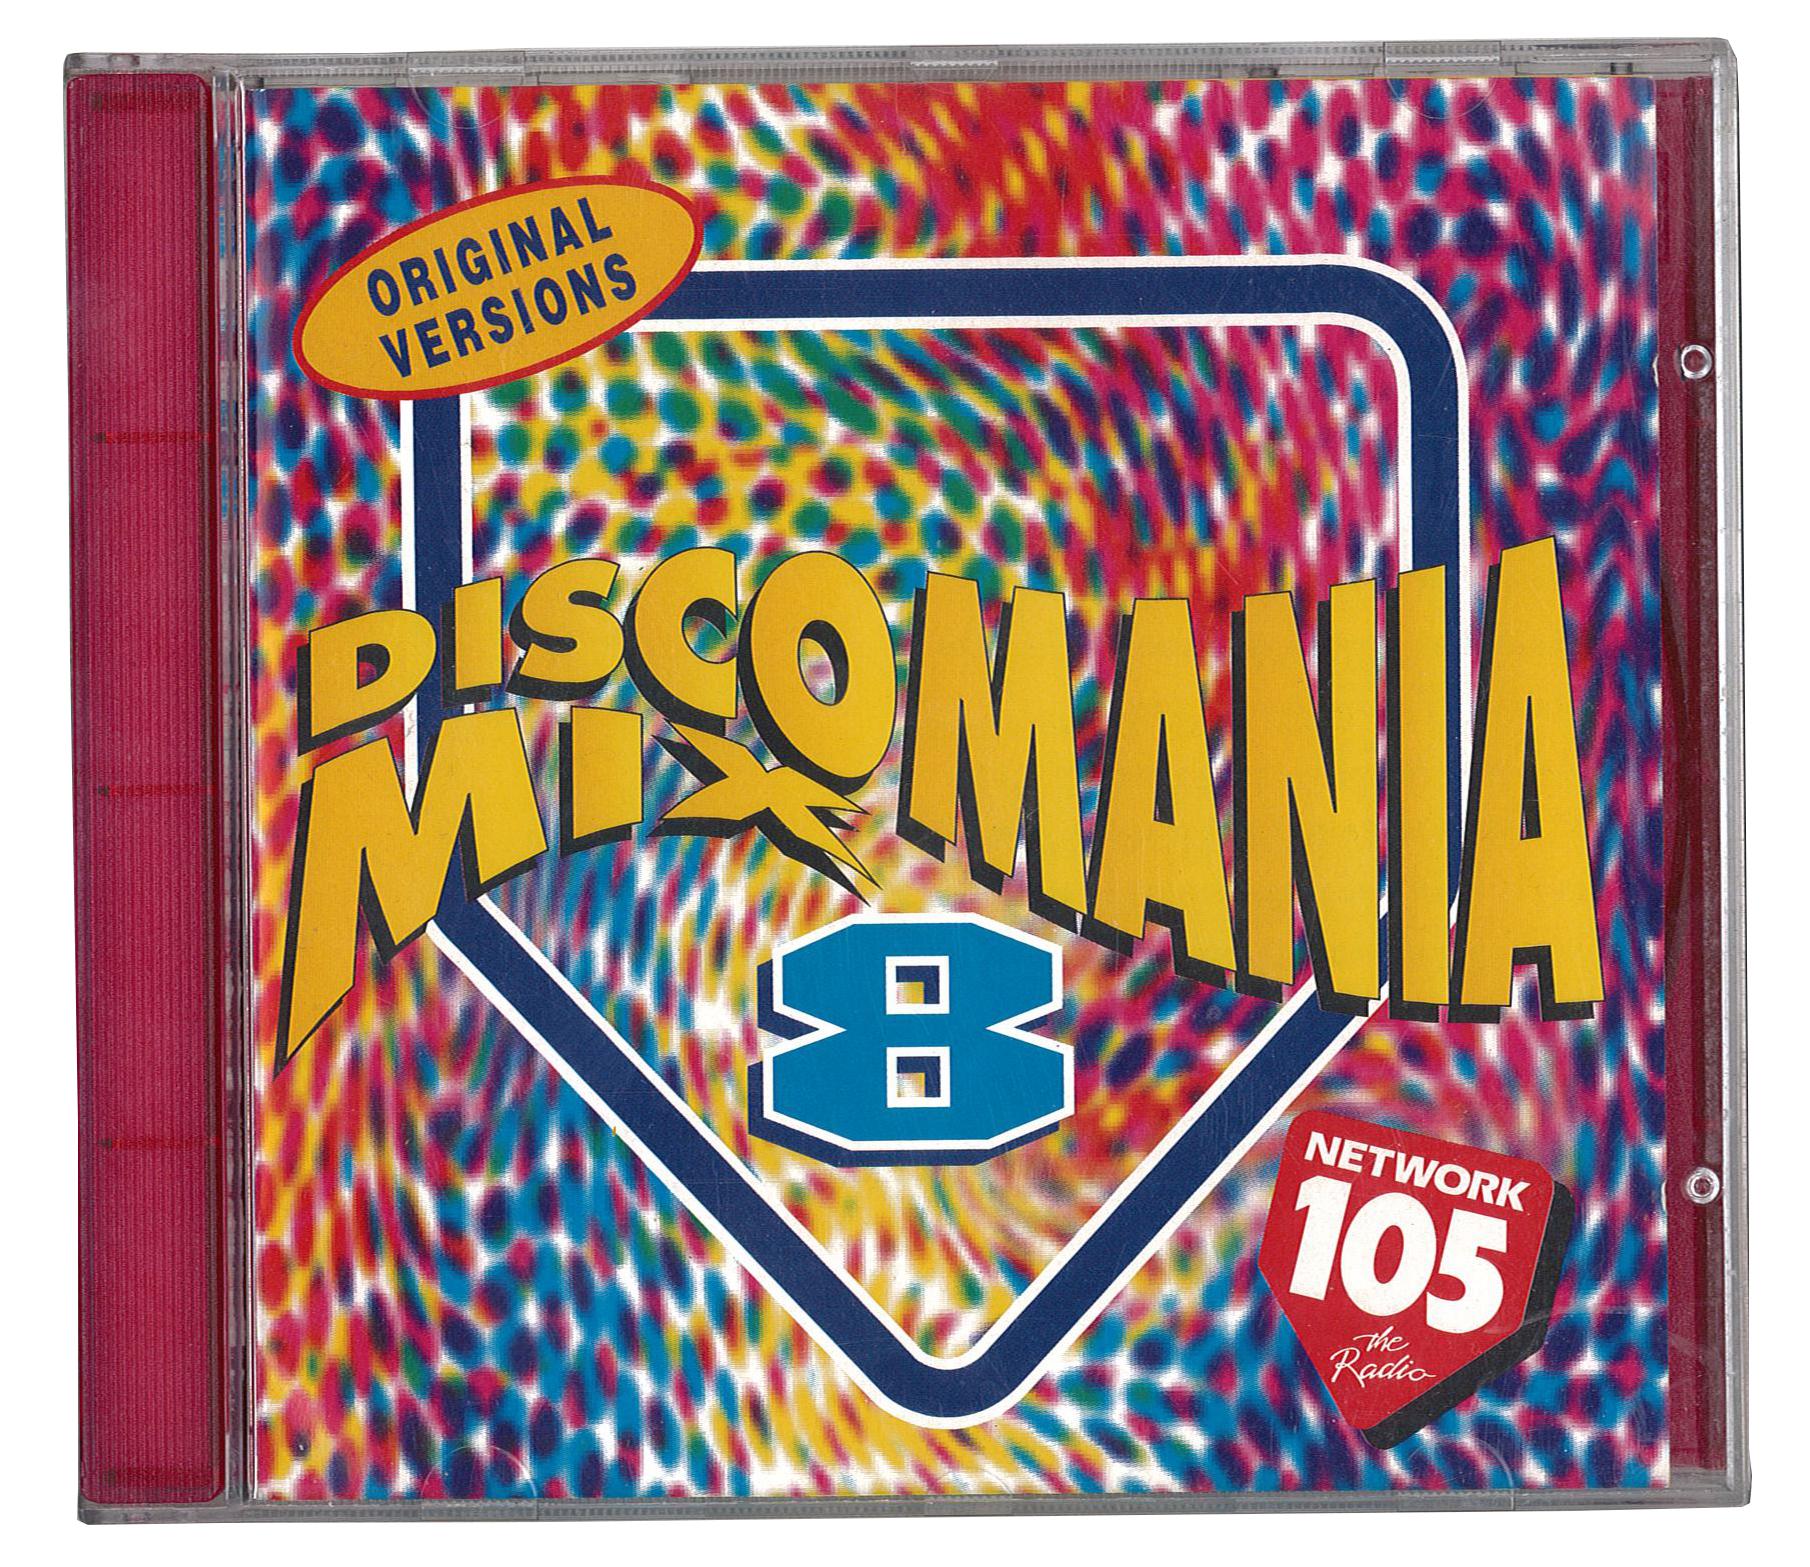 WLWLTDOO-1995-CD-DISCOMANIA_MIX-RTI-1095-2-FRONT.jpg